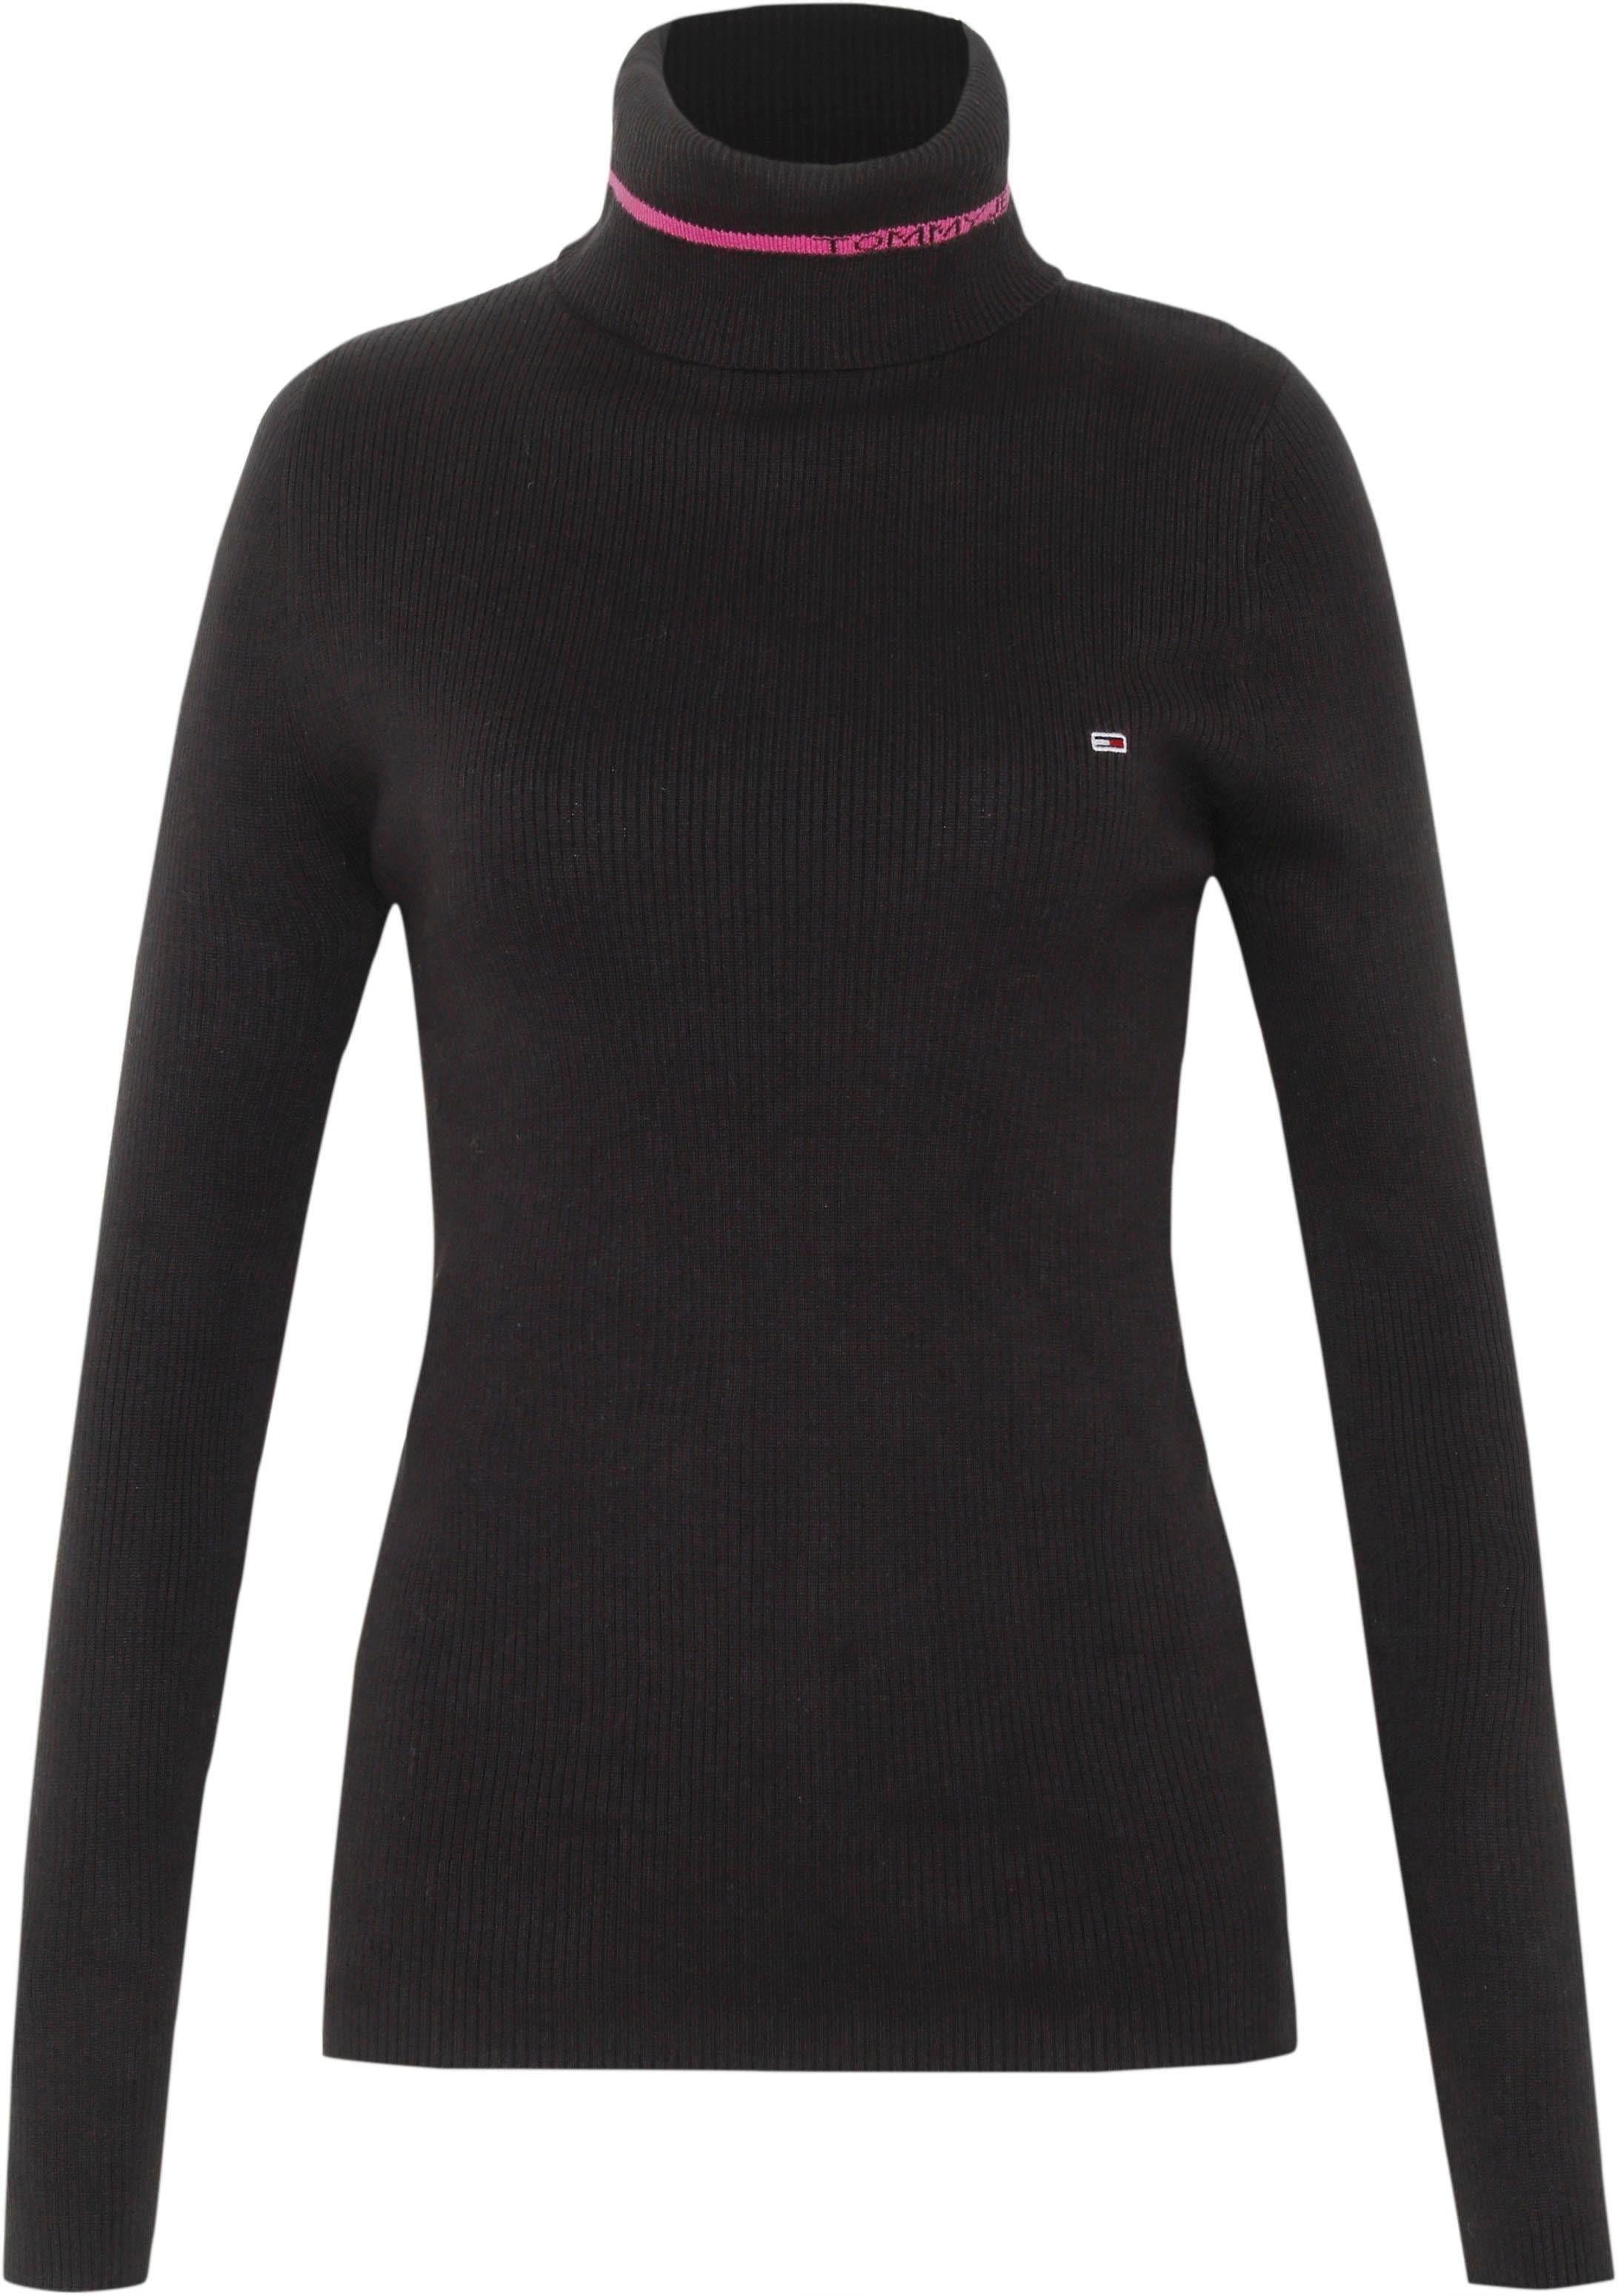 TOMMY JEANS Rollkragenshirt TJW LOGO TURTLENECK SWEATER | Bekleidung > Shirts > Rollkragenshirts | Tommy Jeans